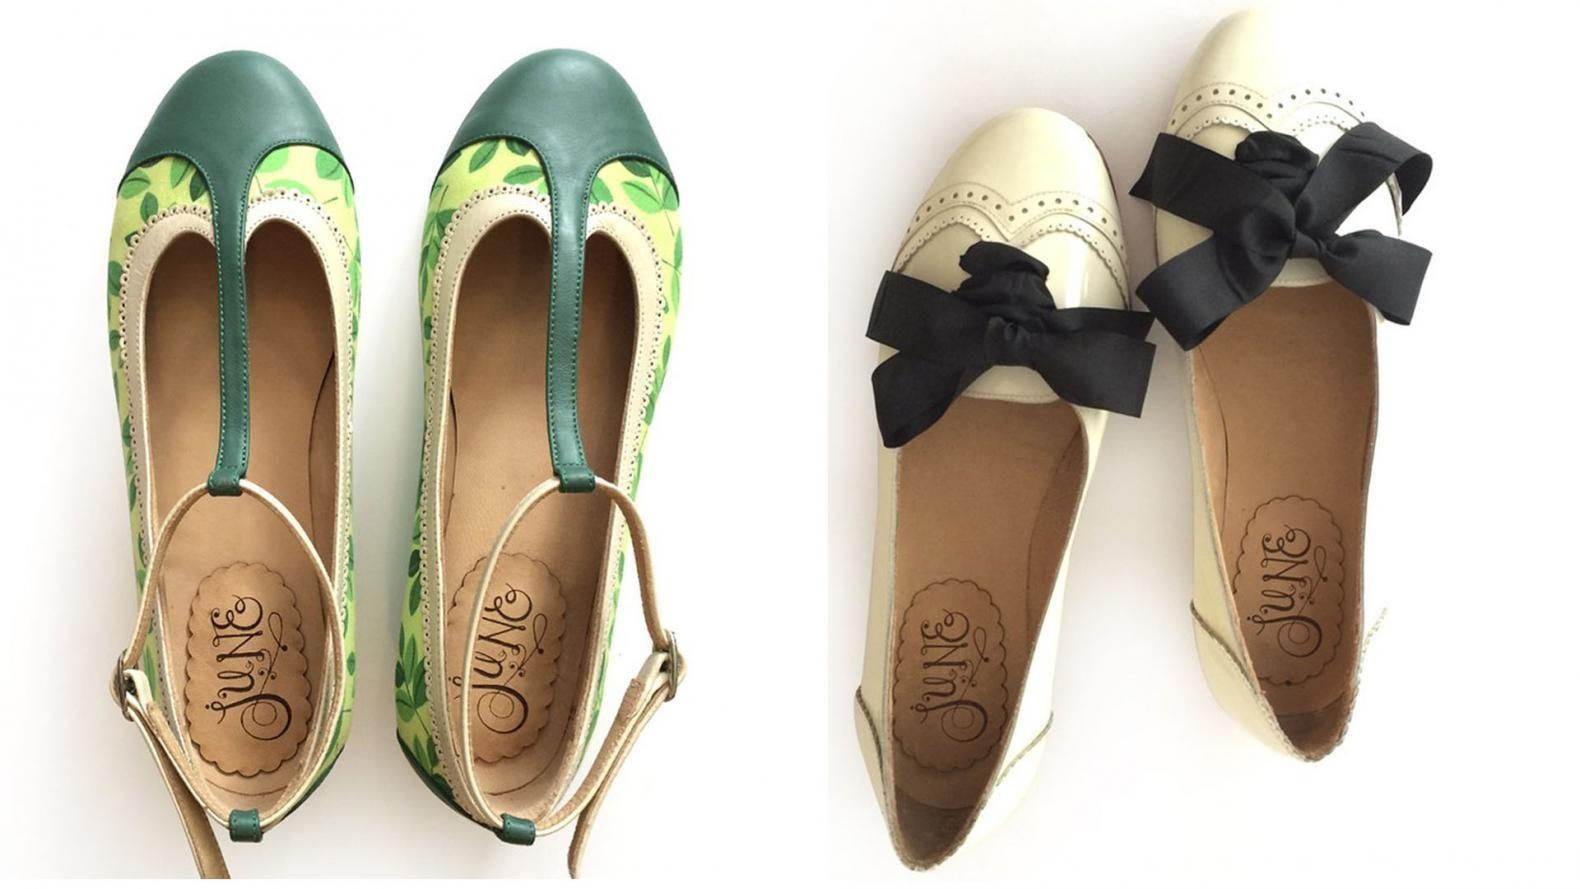 Cinco marcas de zapatos imperdibles  9de24817d63b